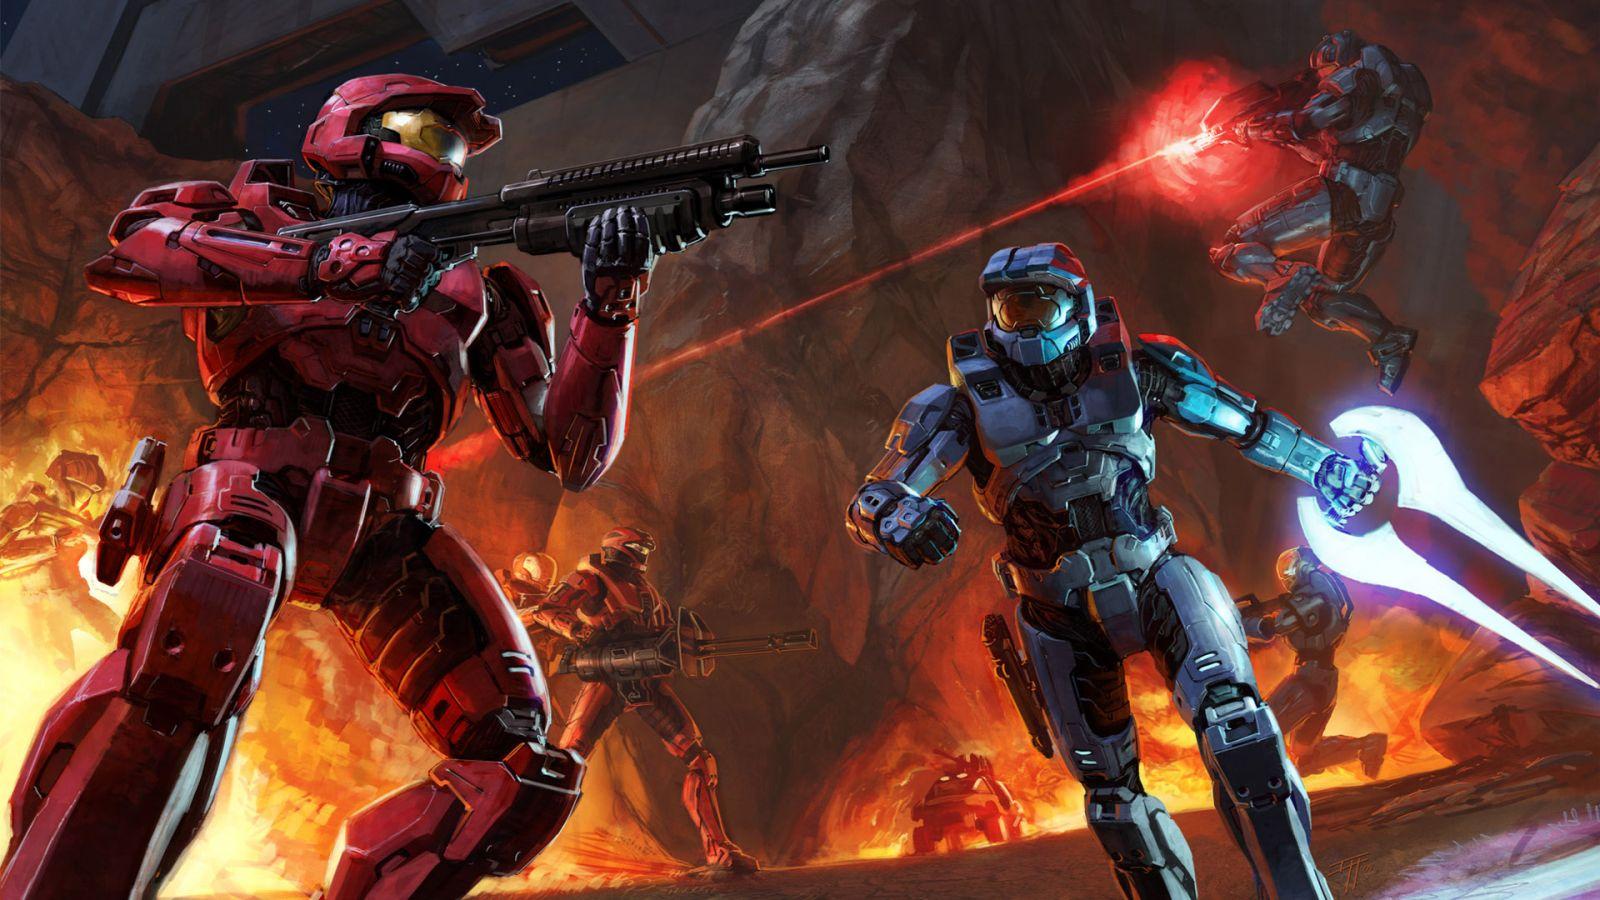 [49+] Halo Red vs Blue Wallpaper on WallpaperSafari